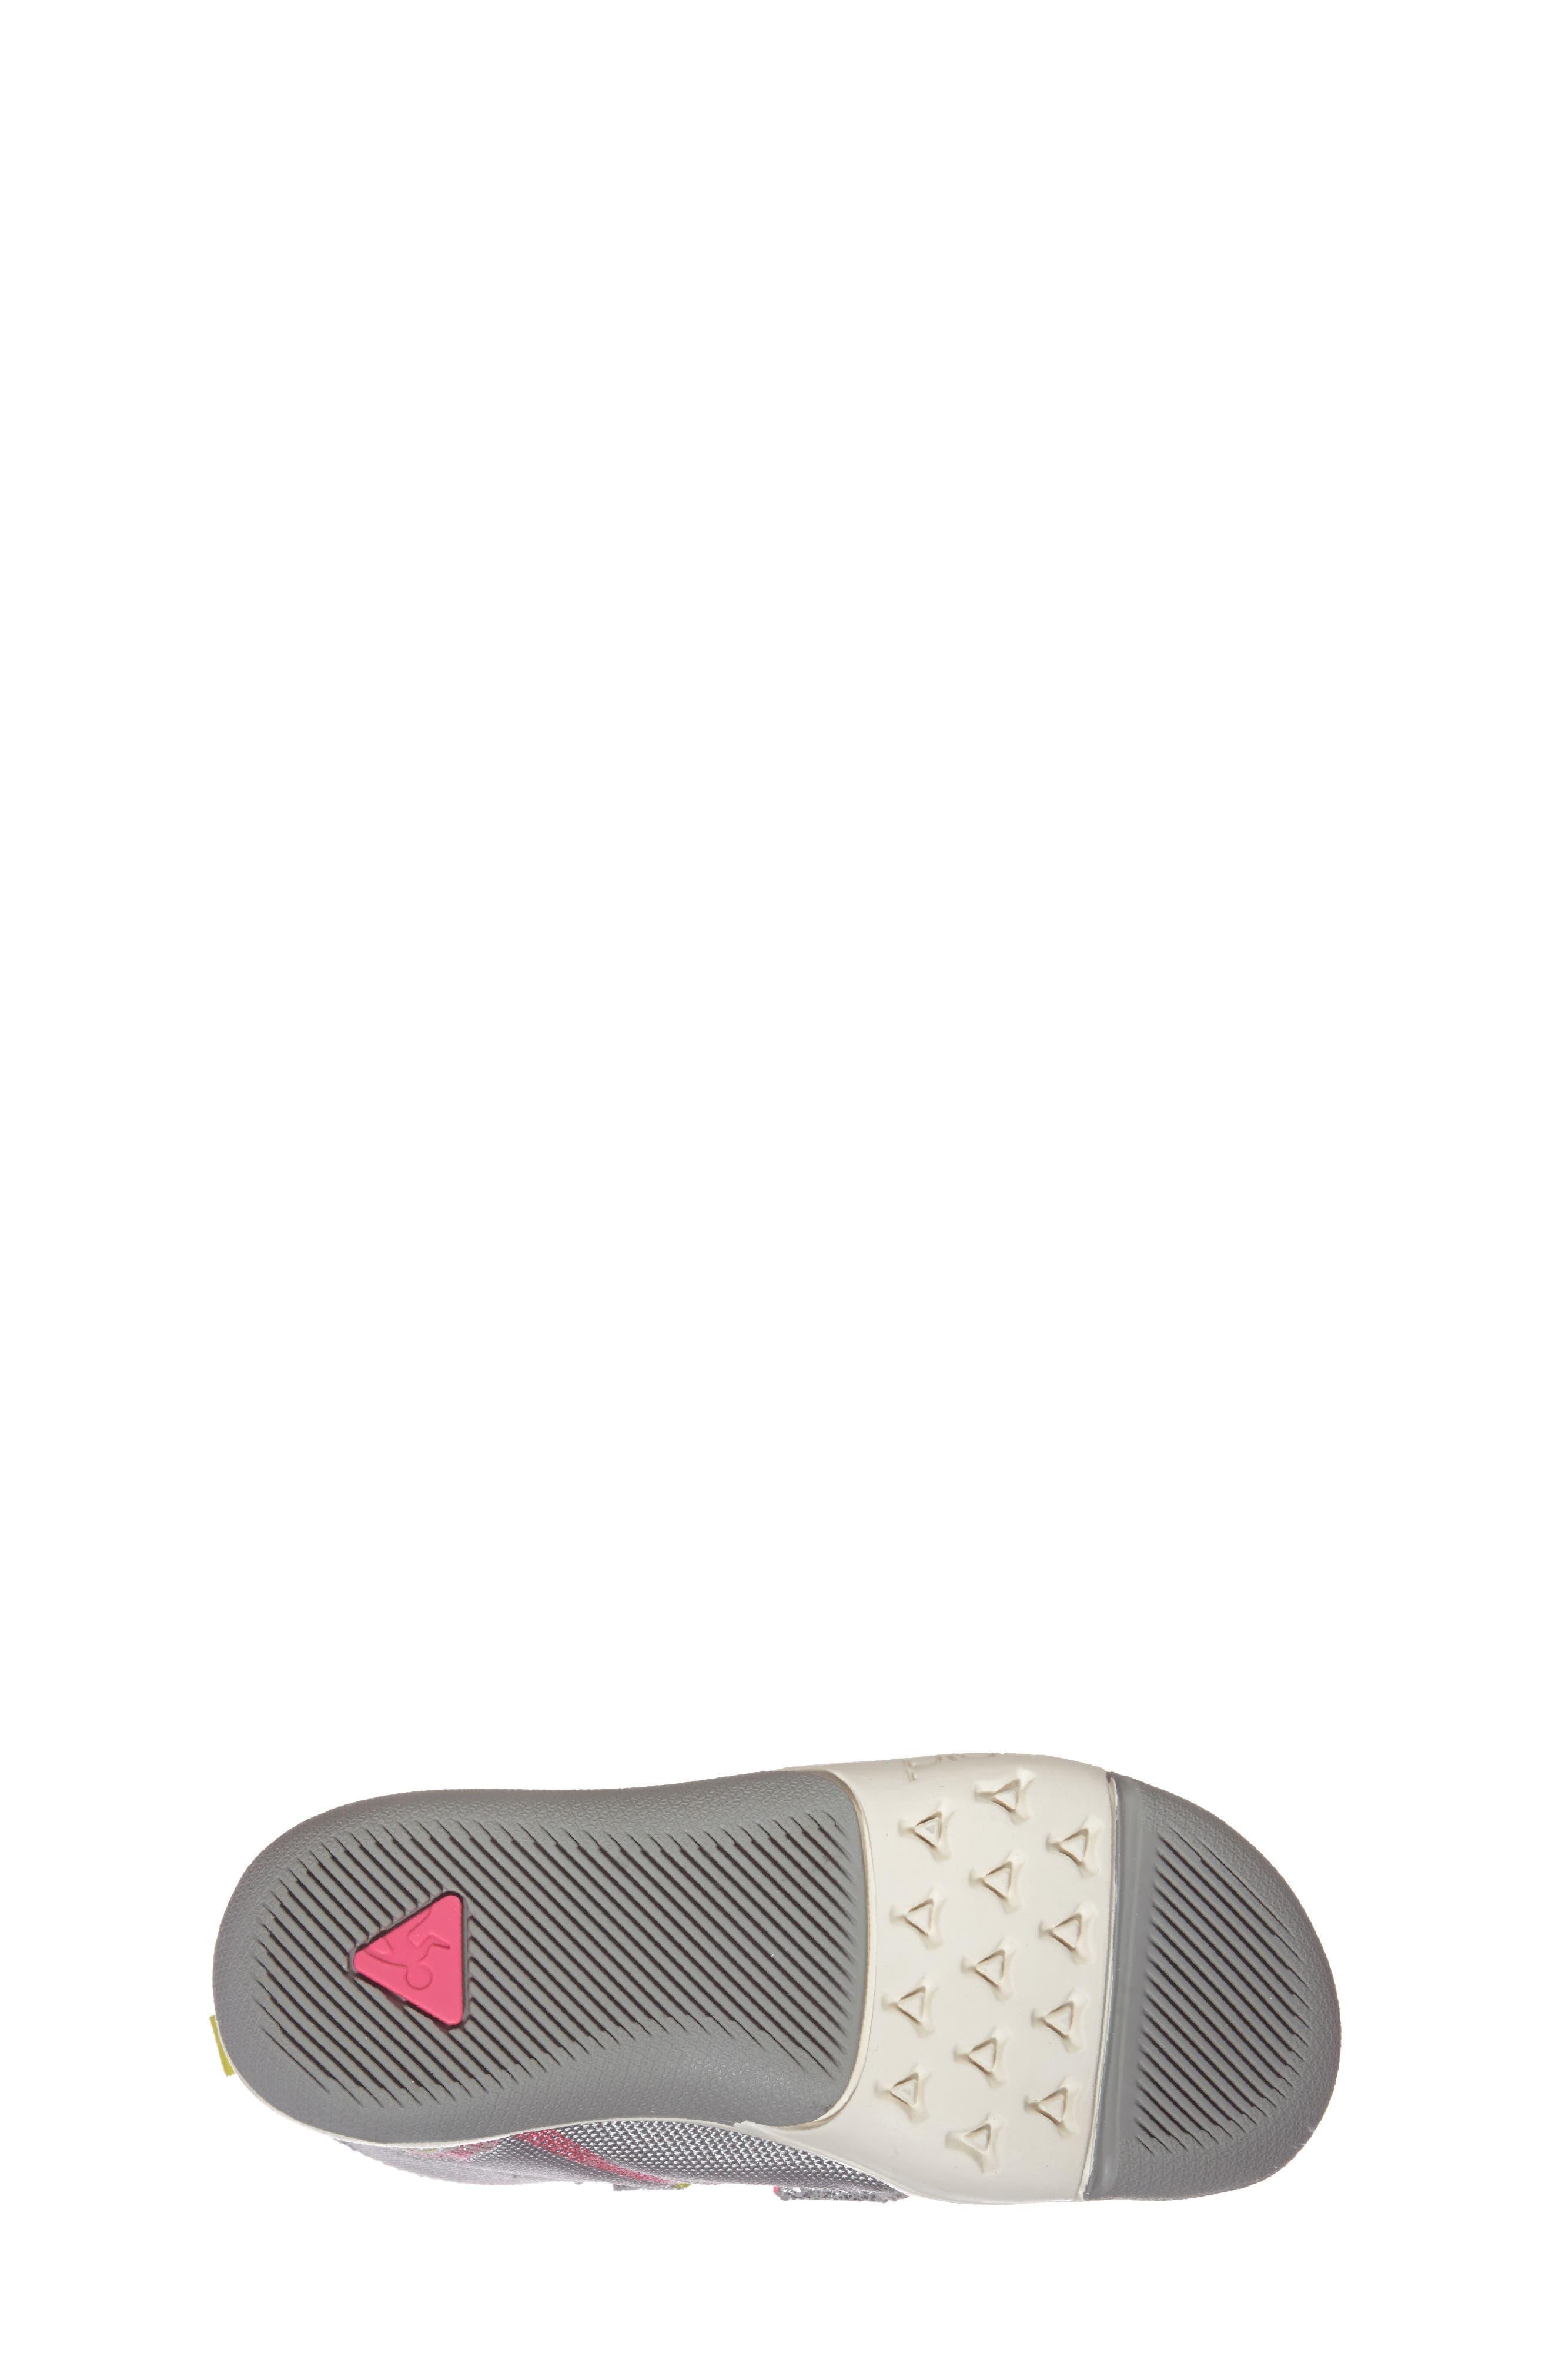 'Max' Customizable High Top Sneaker,                             Alternate thumbnail 3, color,                             040